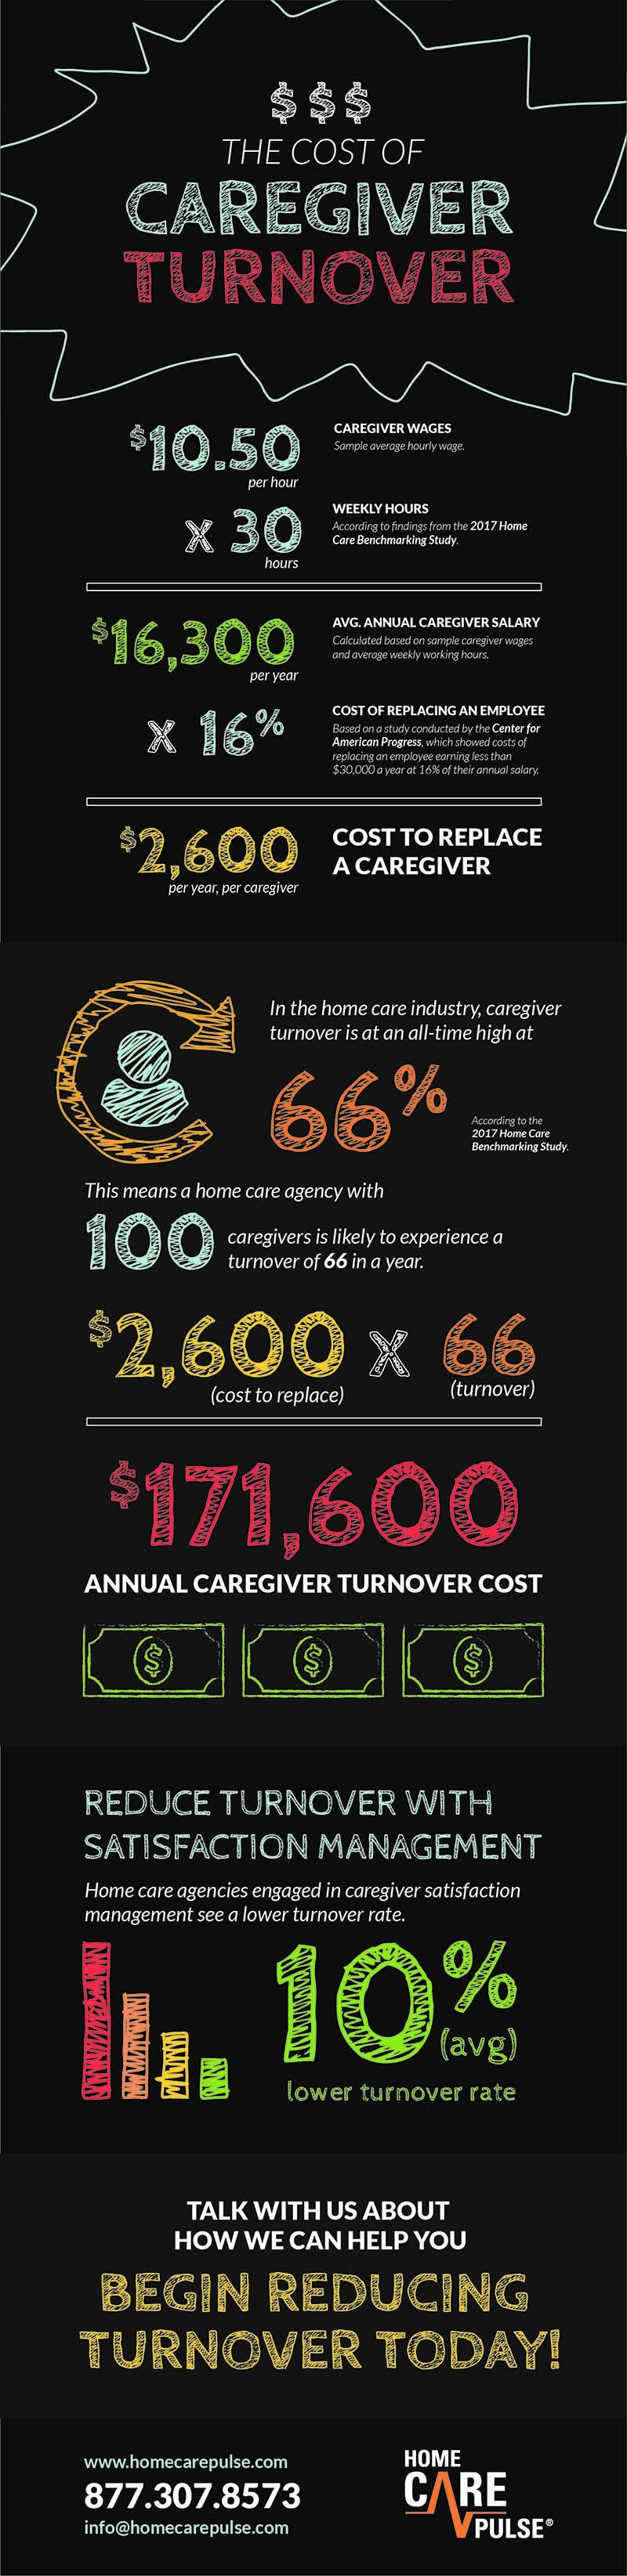 caregiver turnover calculator infographic